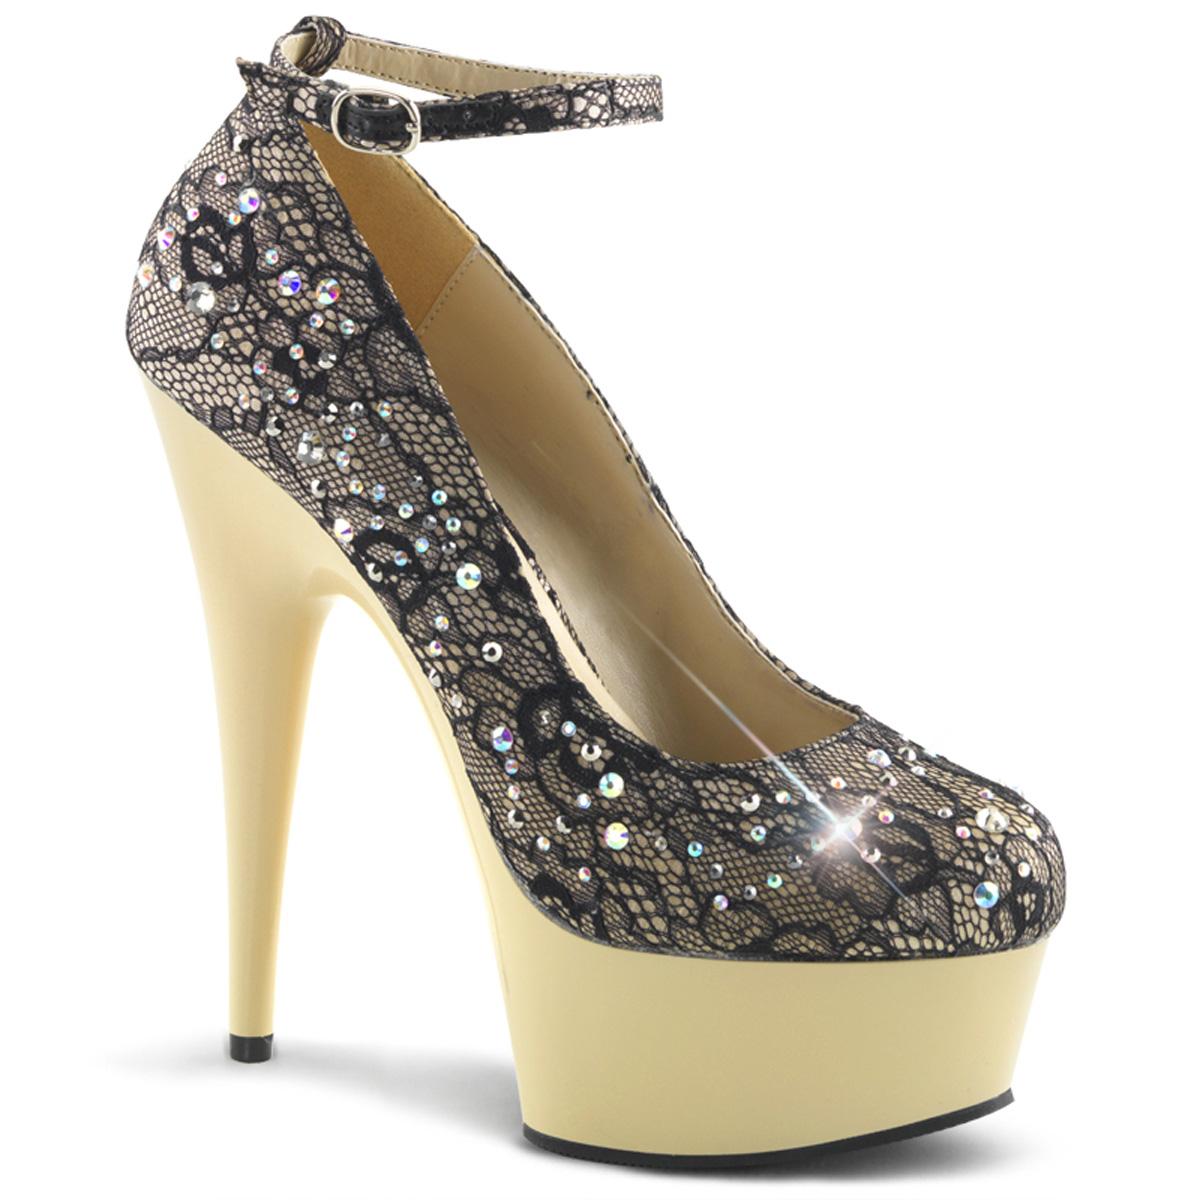 PLEASER-Womens-1-3-4-Platform-Ankle-Strap-Rhinestone-Detail-Pump-DELIGHT-686LC